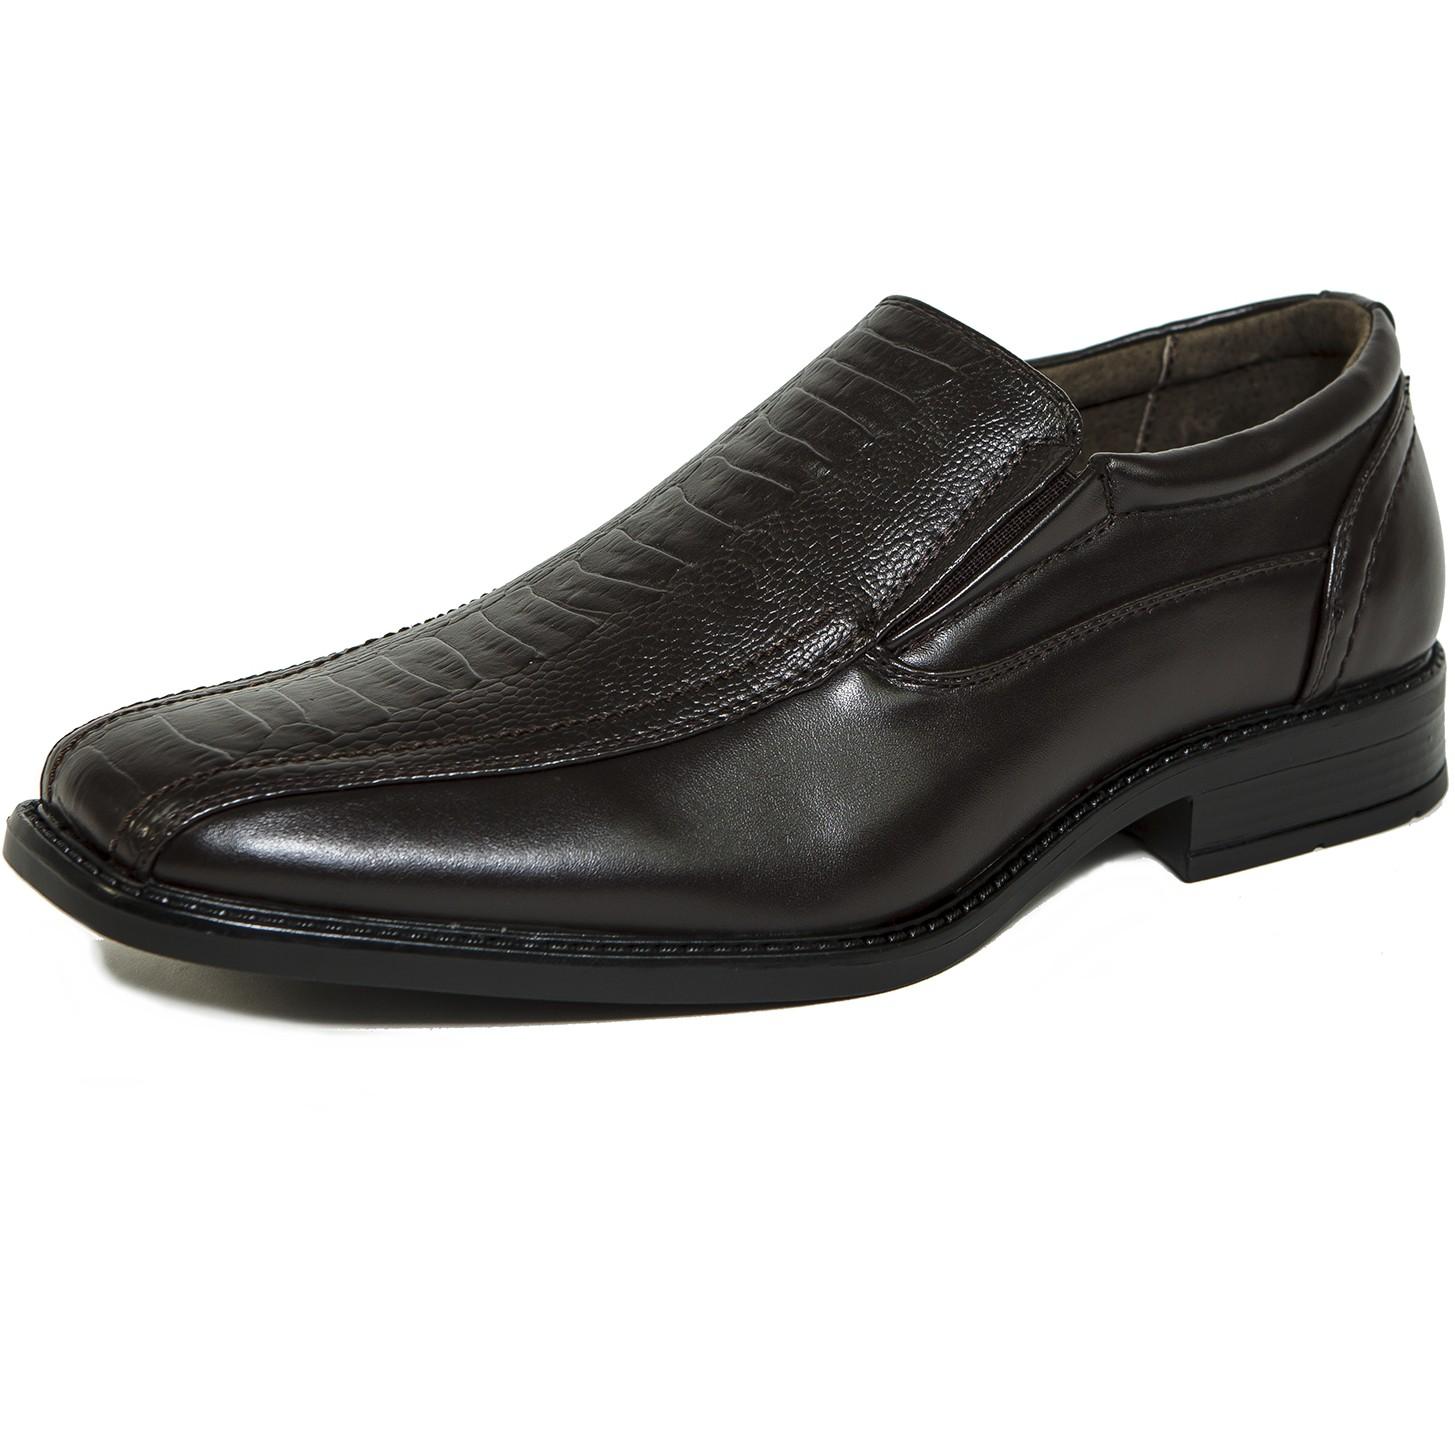 Croft And Barrow Mens Dress Shoes